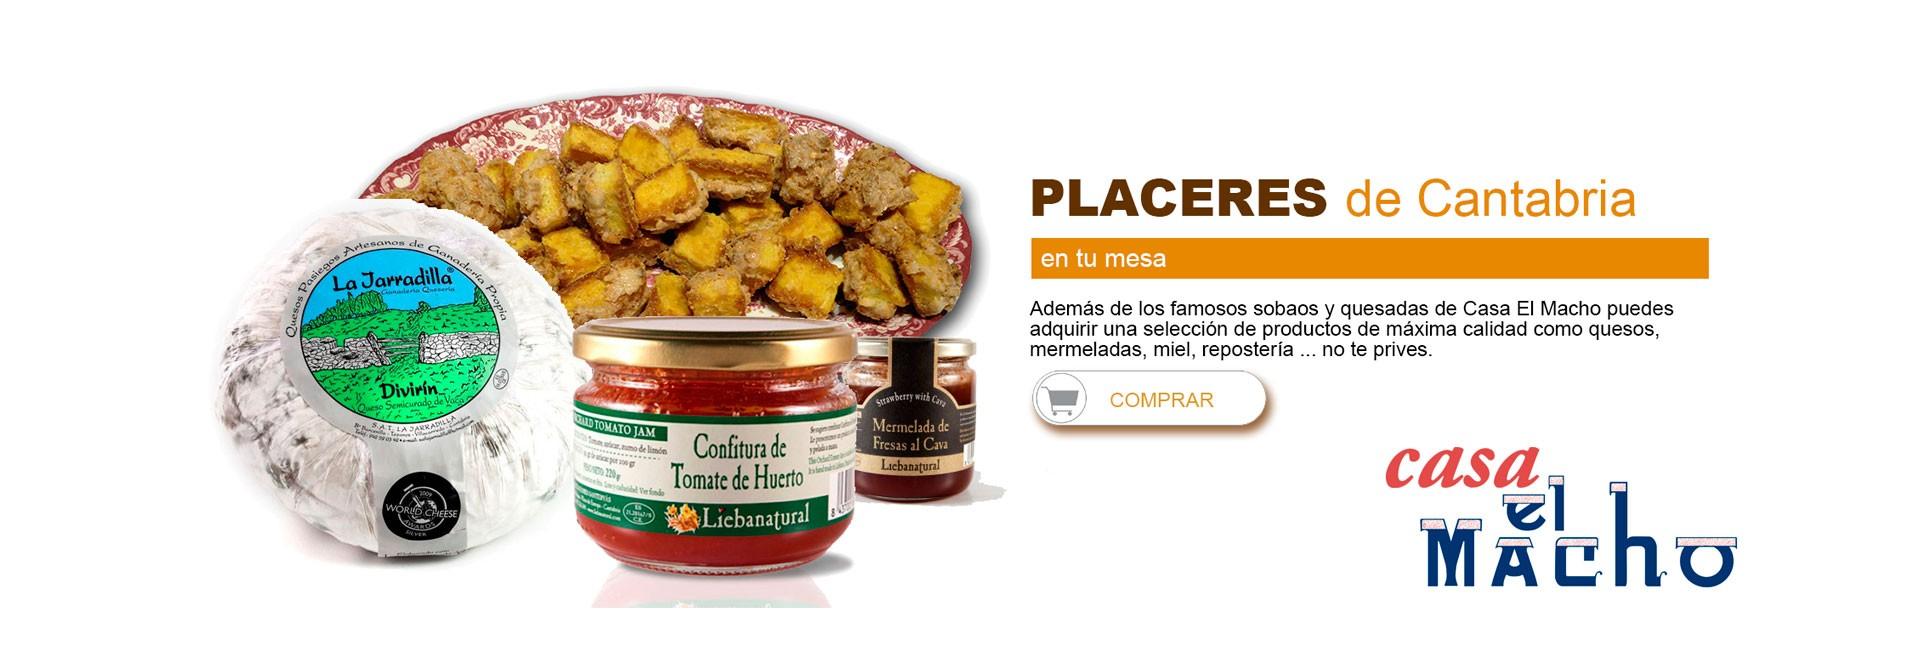 Productos de Cantabria